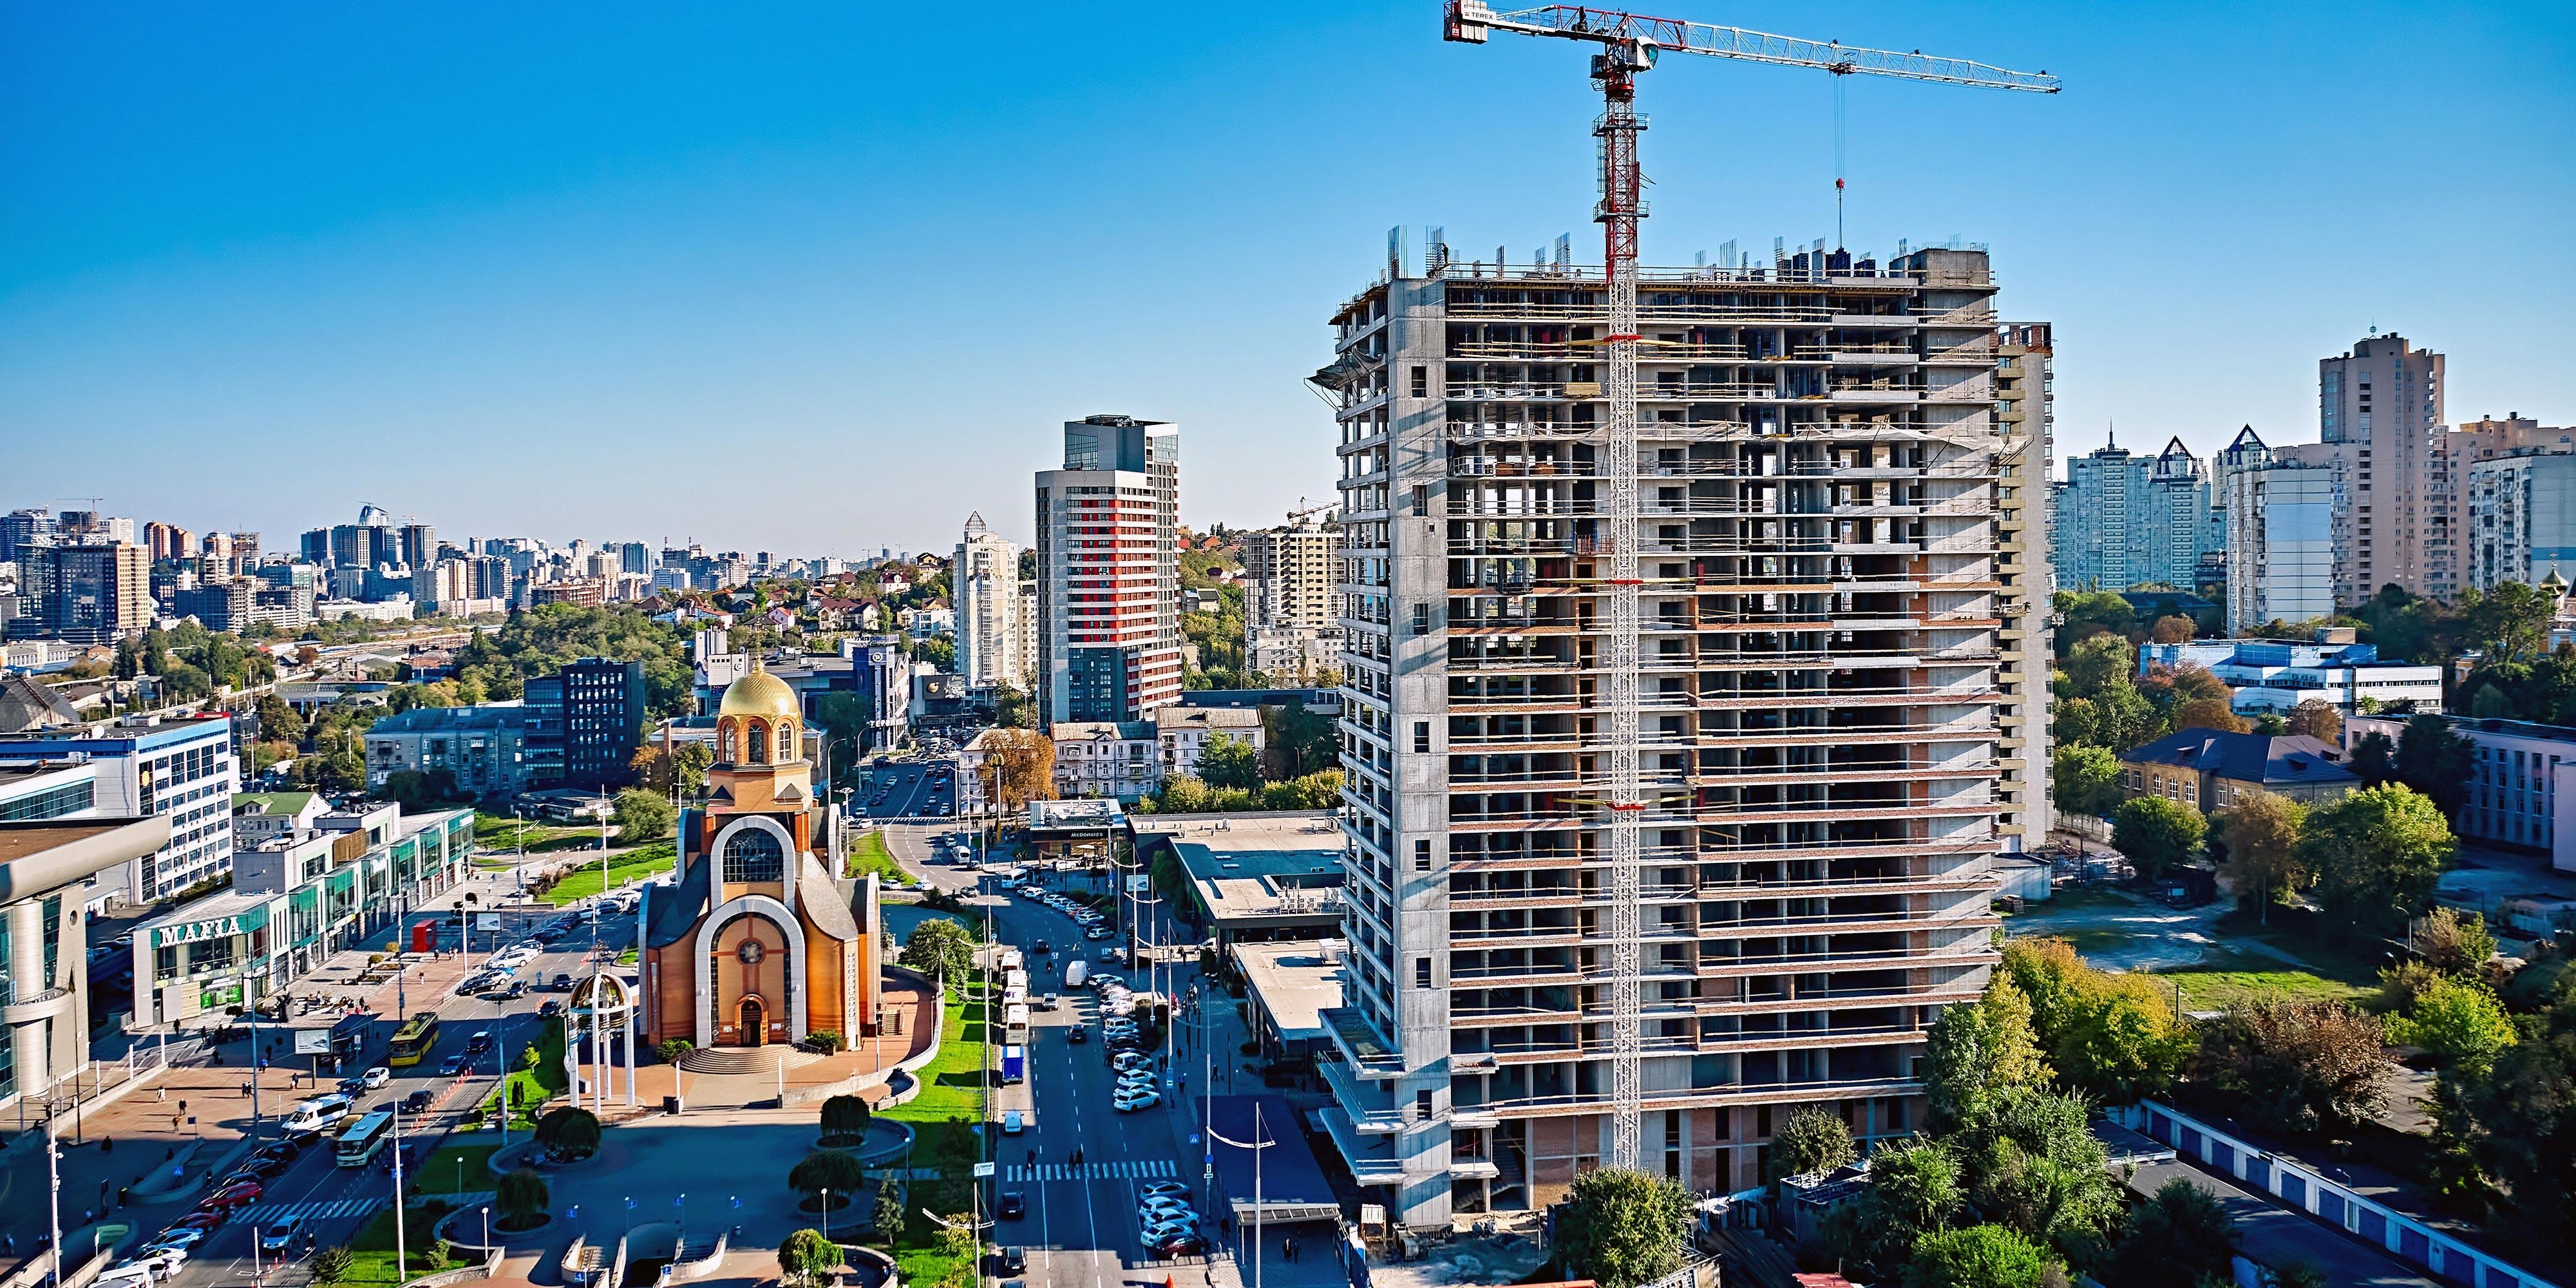 Construction progress of S1 TERMINAL. September 2021